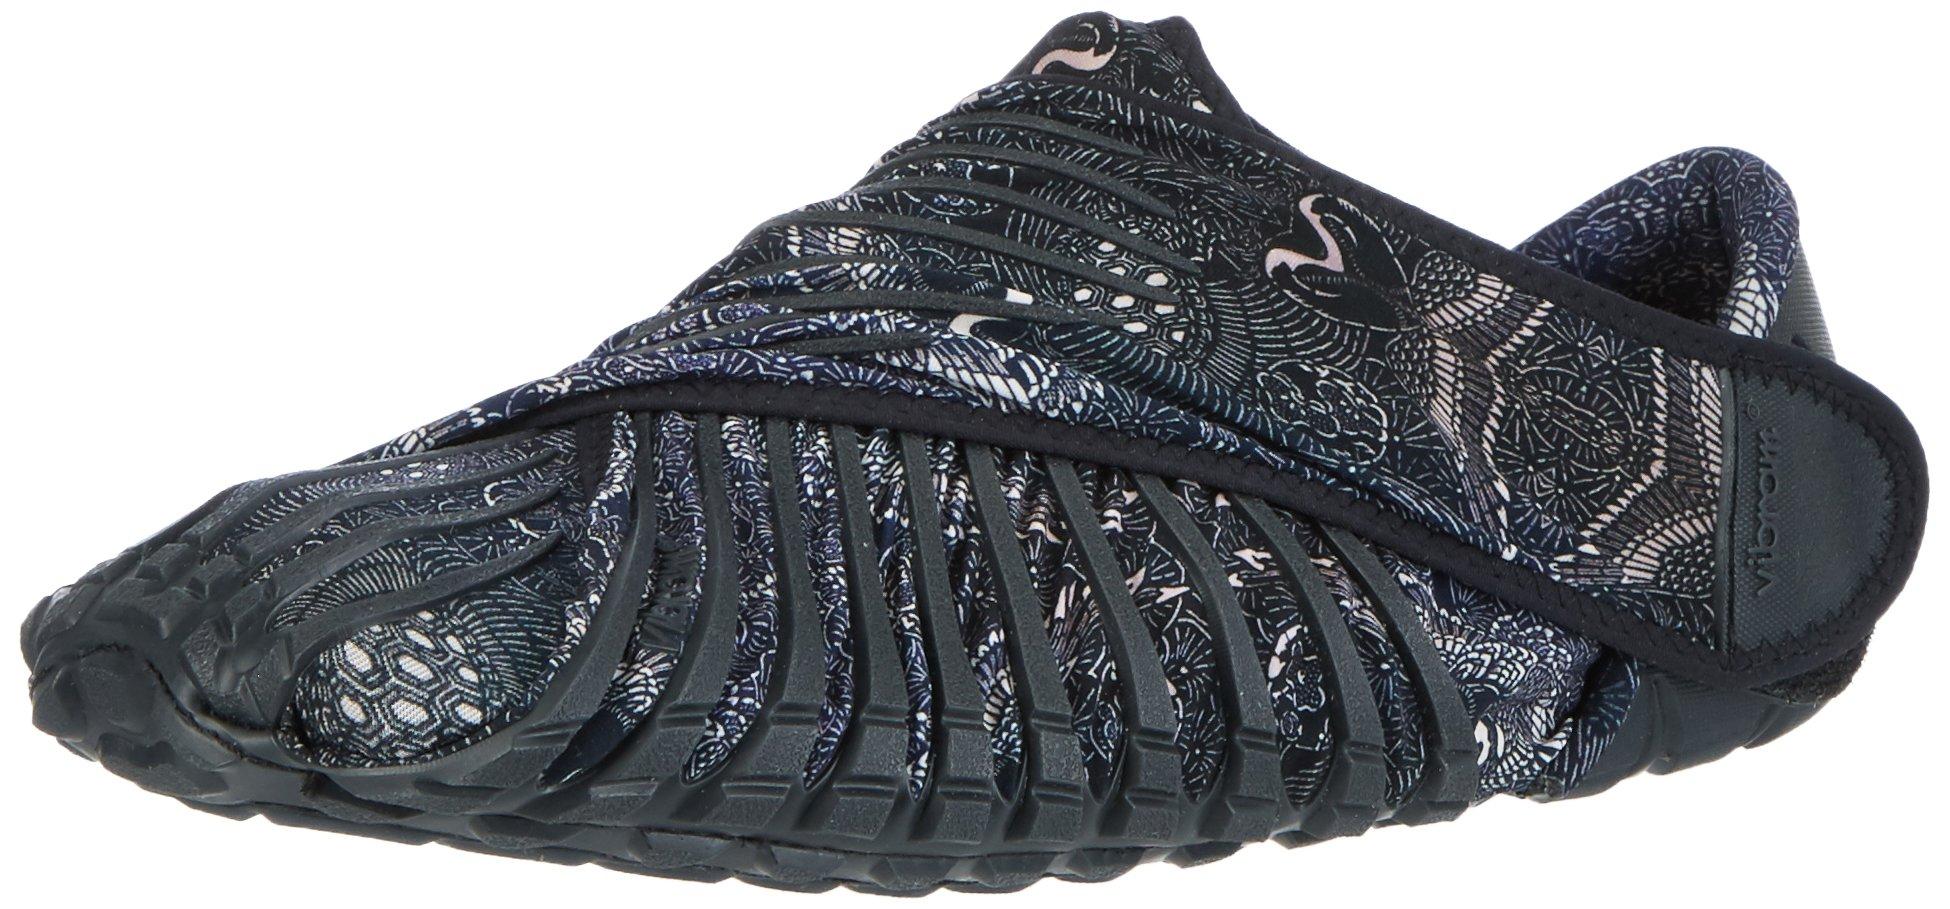 Vibram Men's and Women's Furoshiki Gru Sneaker, Black Paisley, EU:42-43/UK MAN:8-9/UK WOMAN:9-10.5/cm:26.5-27.5/US MAN:9-10/US WOMAN:10-11.5